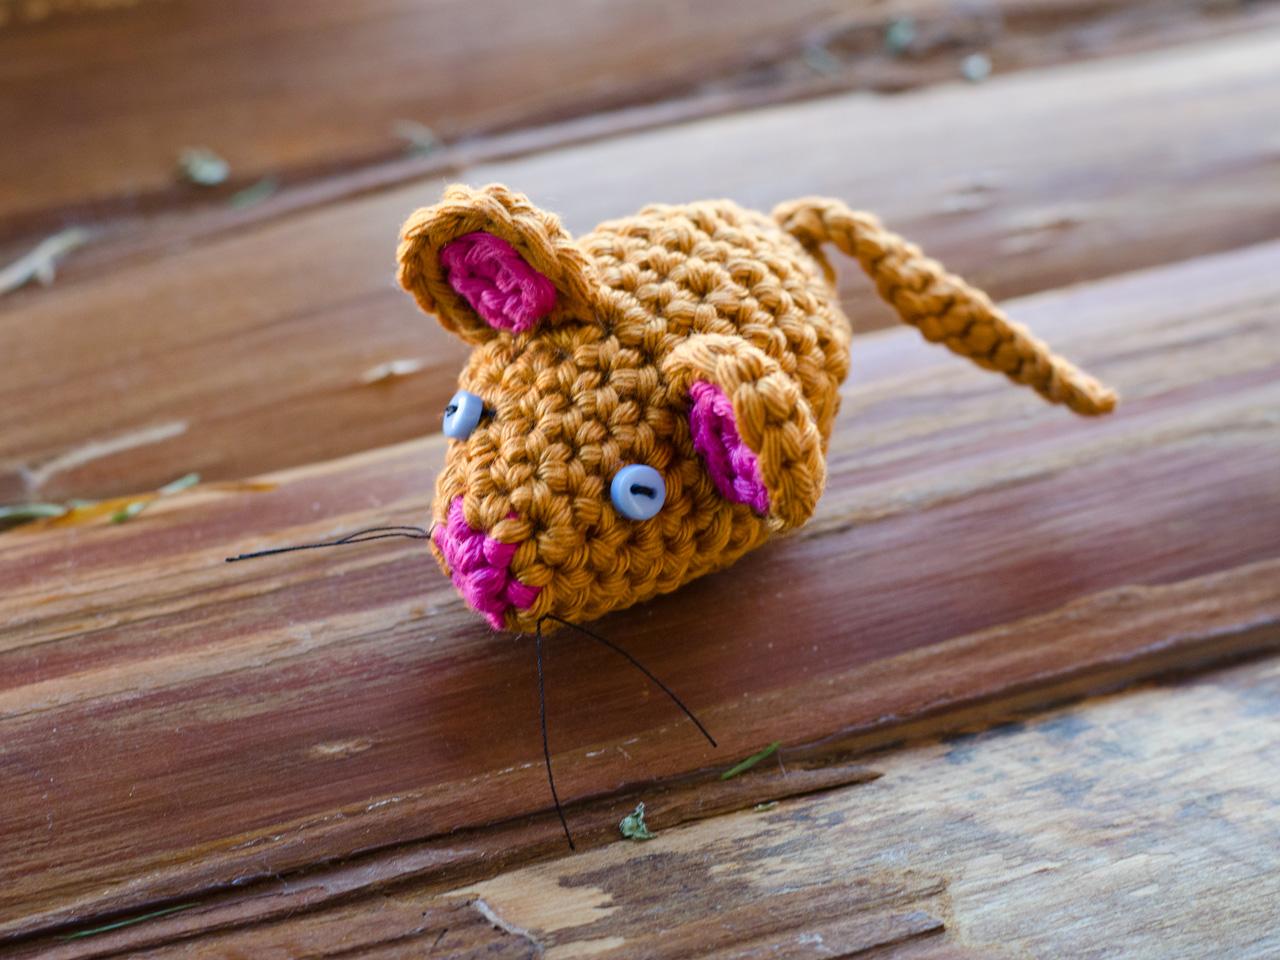 Kleine Maus Amigurumi Groaaar By Anjizilla